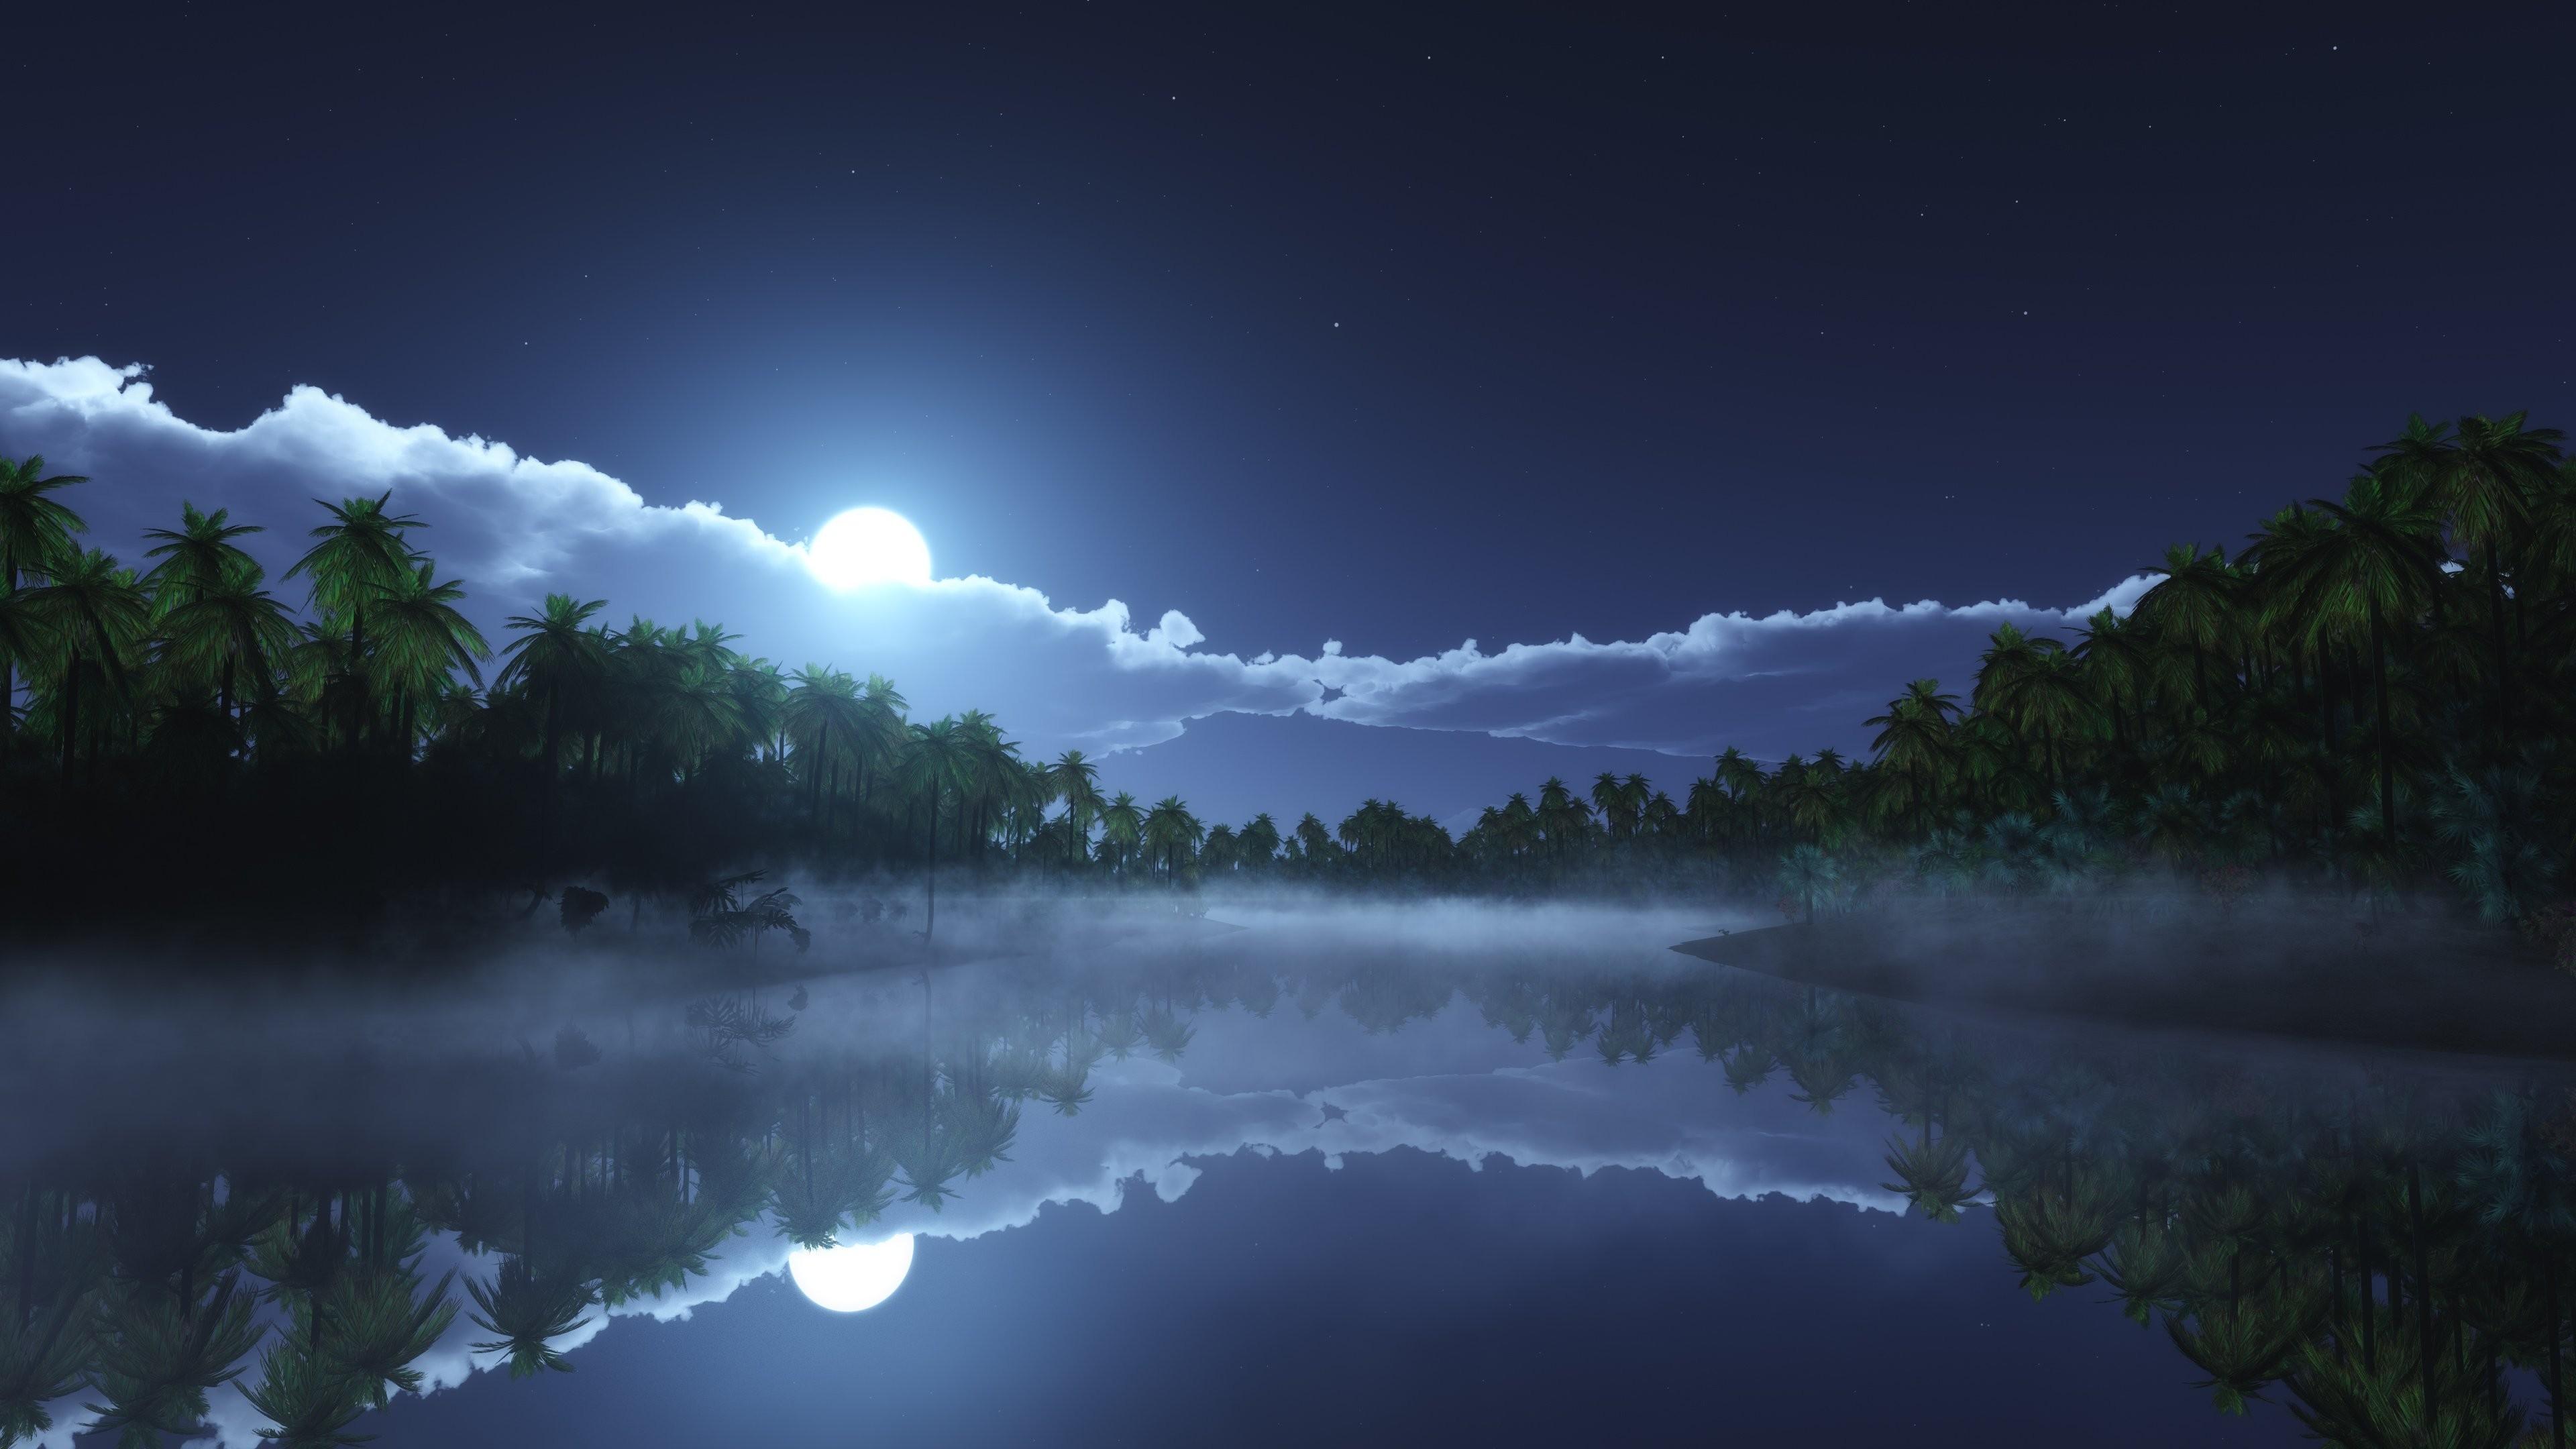 wallpaper river, 4k, hd wallpaper, sea, palms, night, moon, clouds